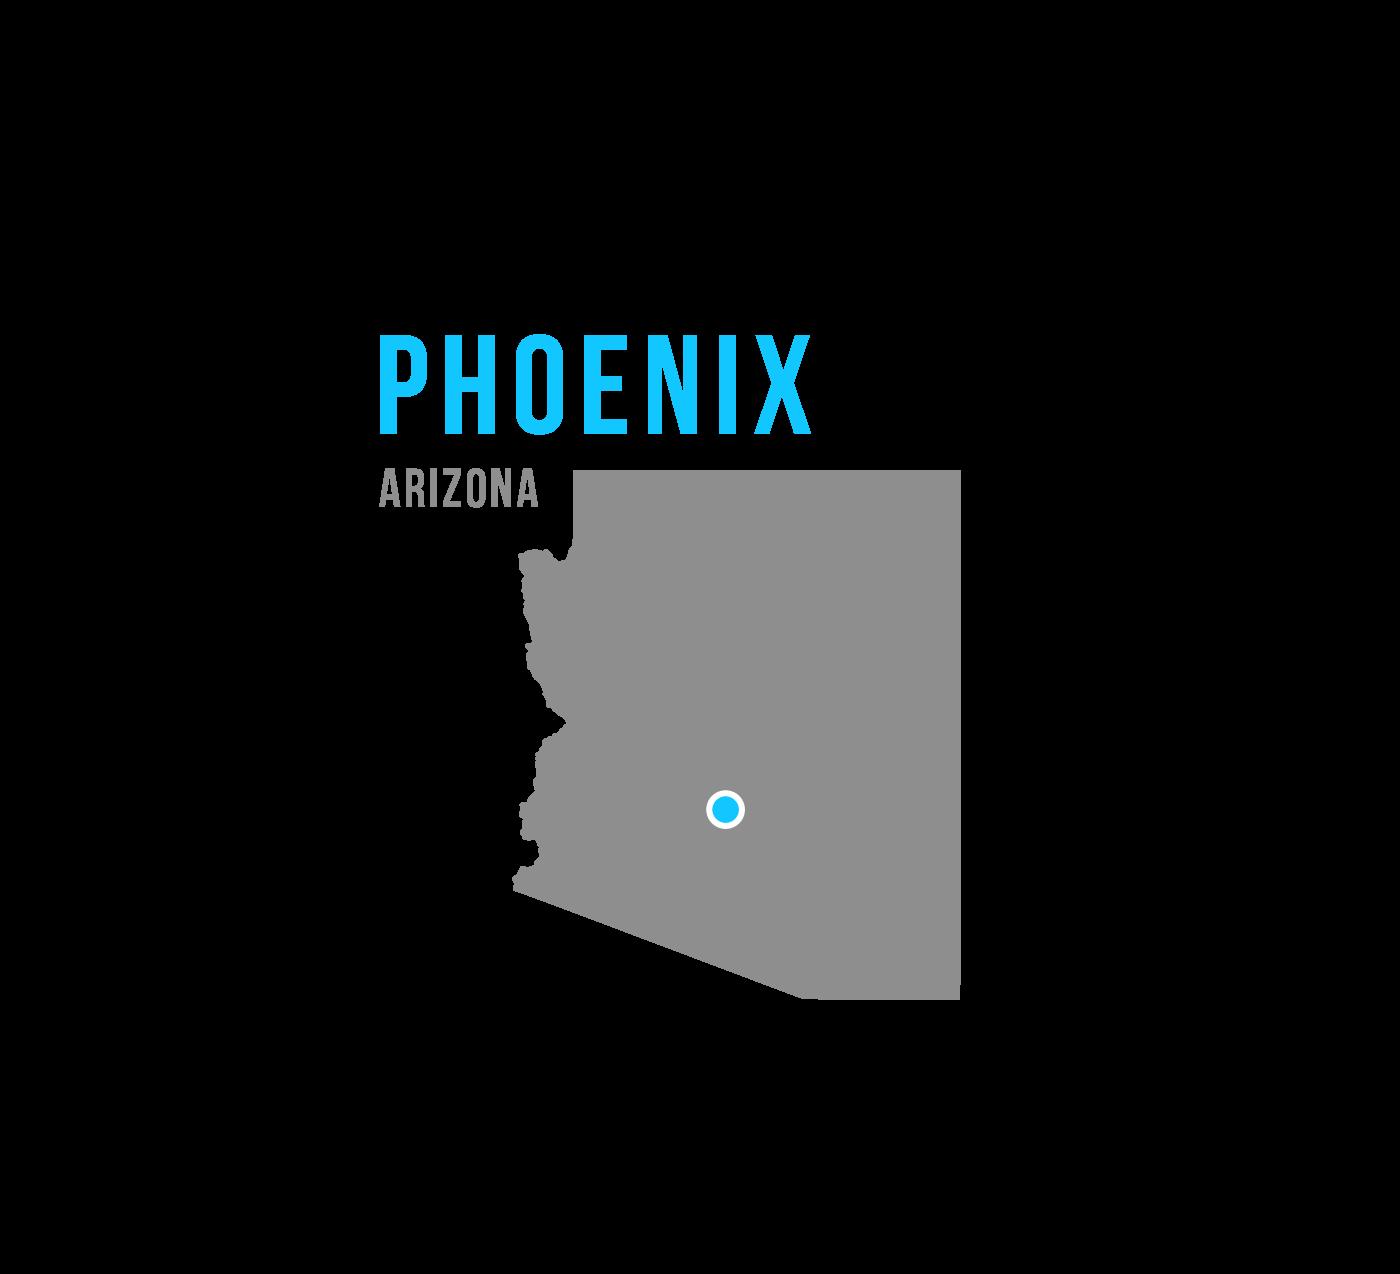 arizona-phoenix.png